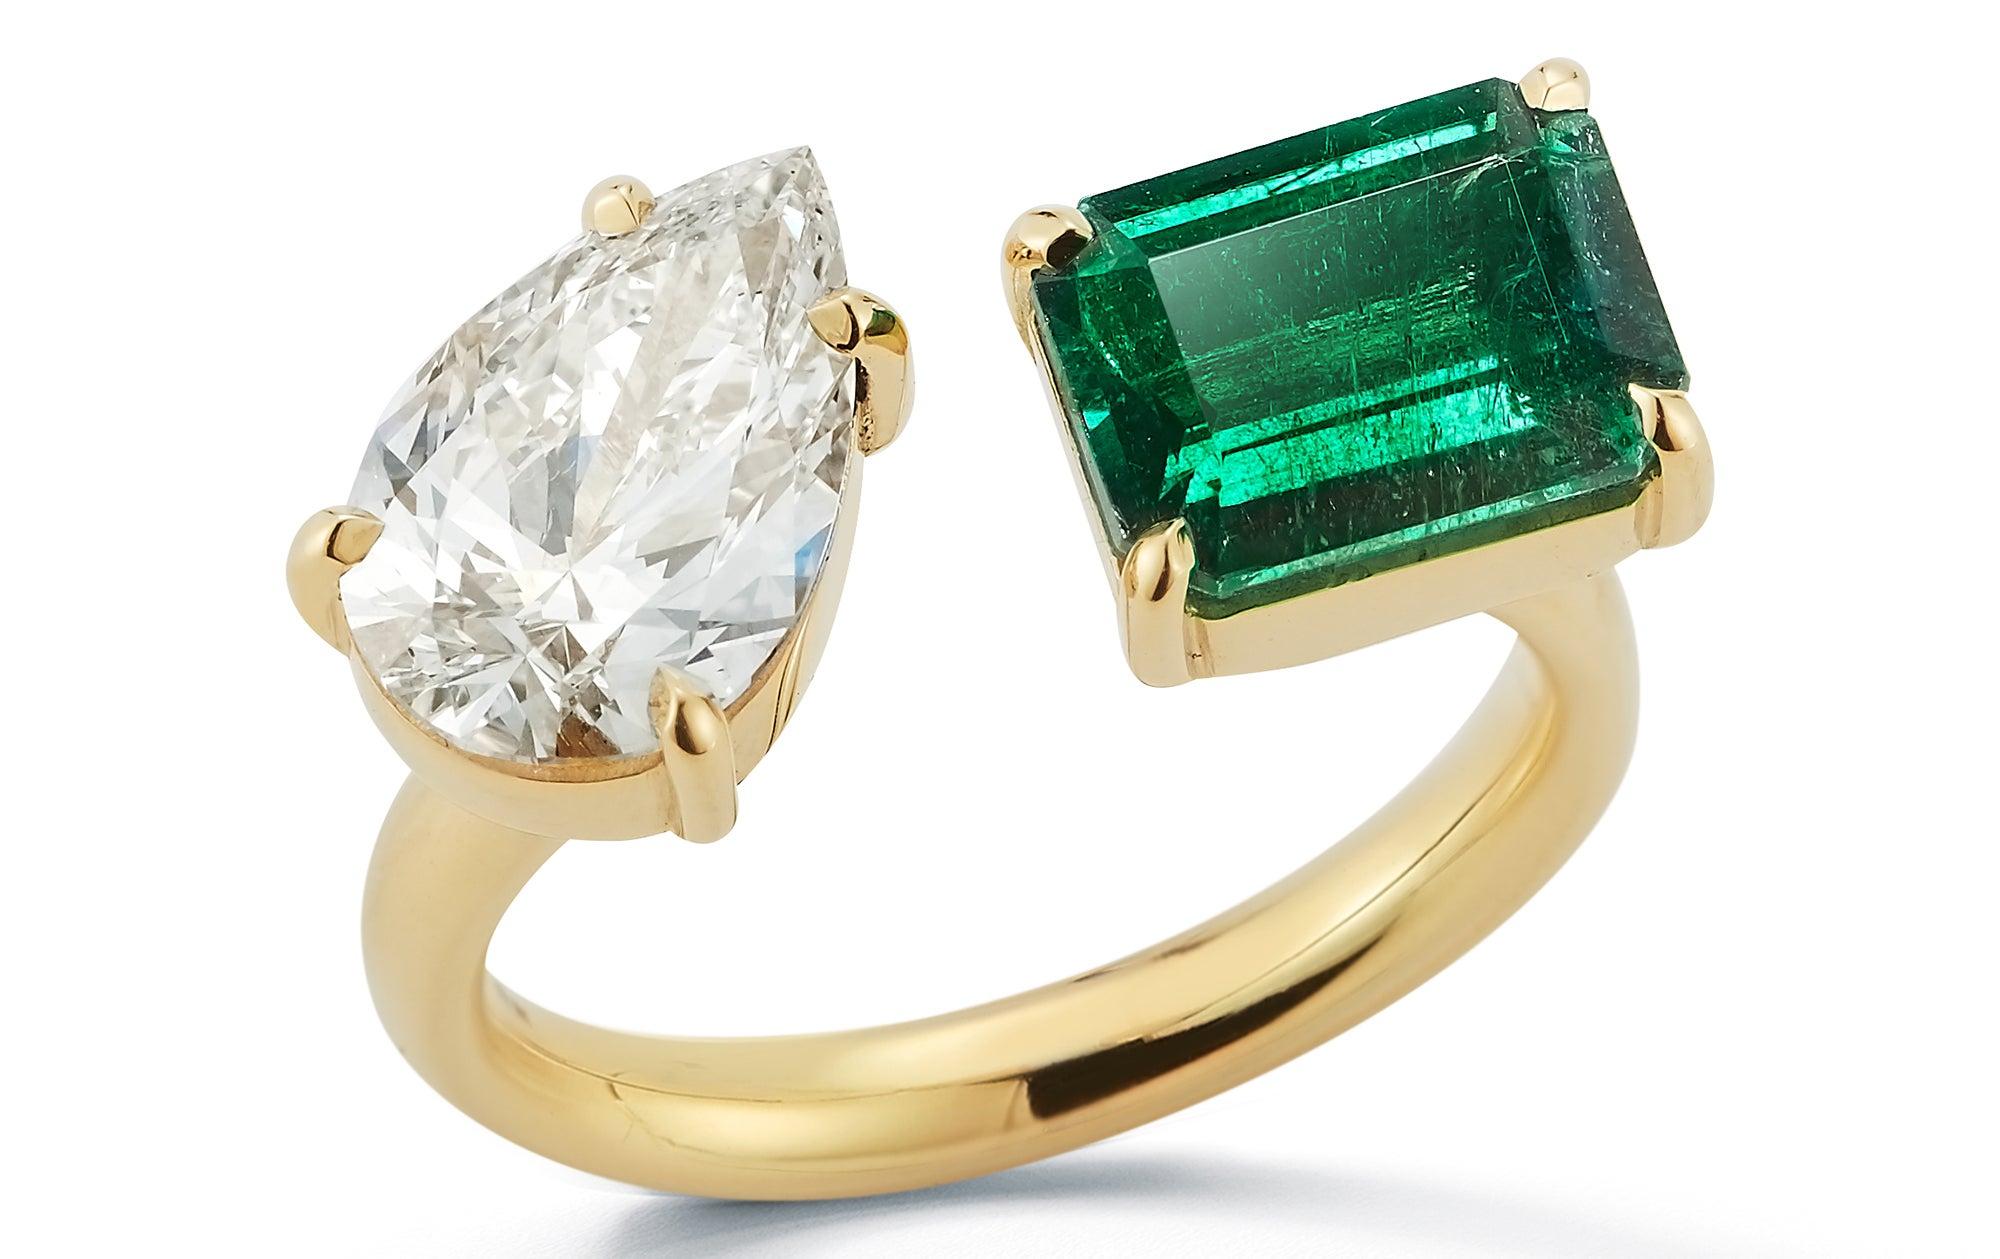 Jemma Wynne Diamond Pear and Emerald Open Ring